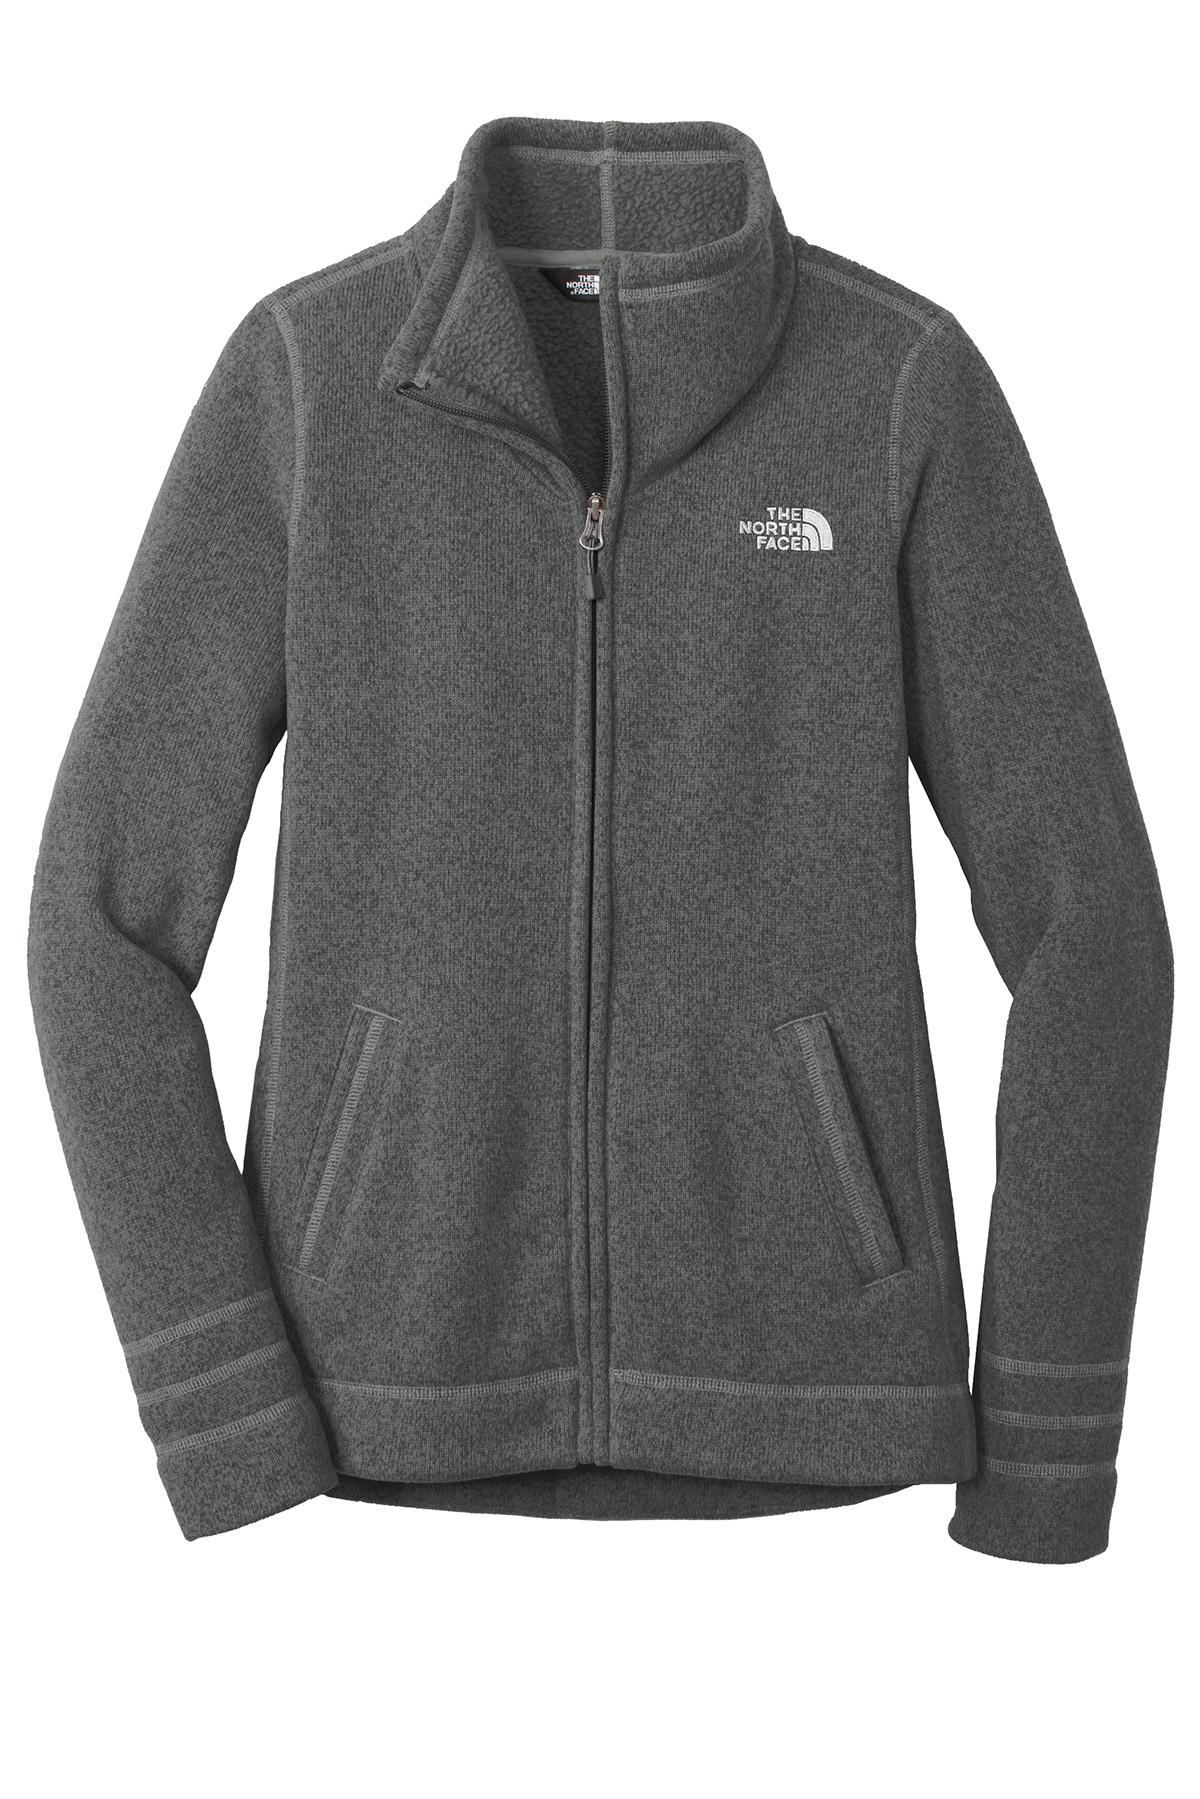 52c958a0d The North Face® Ladies Sweater Fleece Jacket | Sweatshirts/Fleece ...